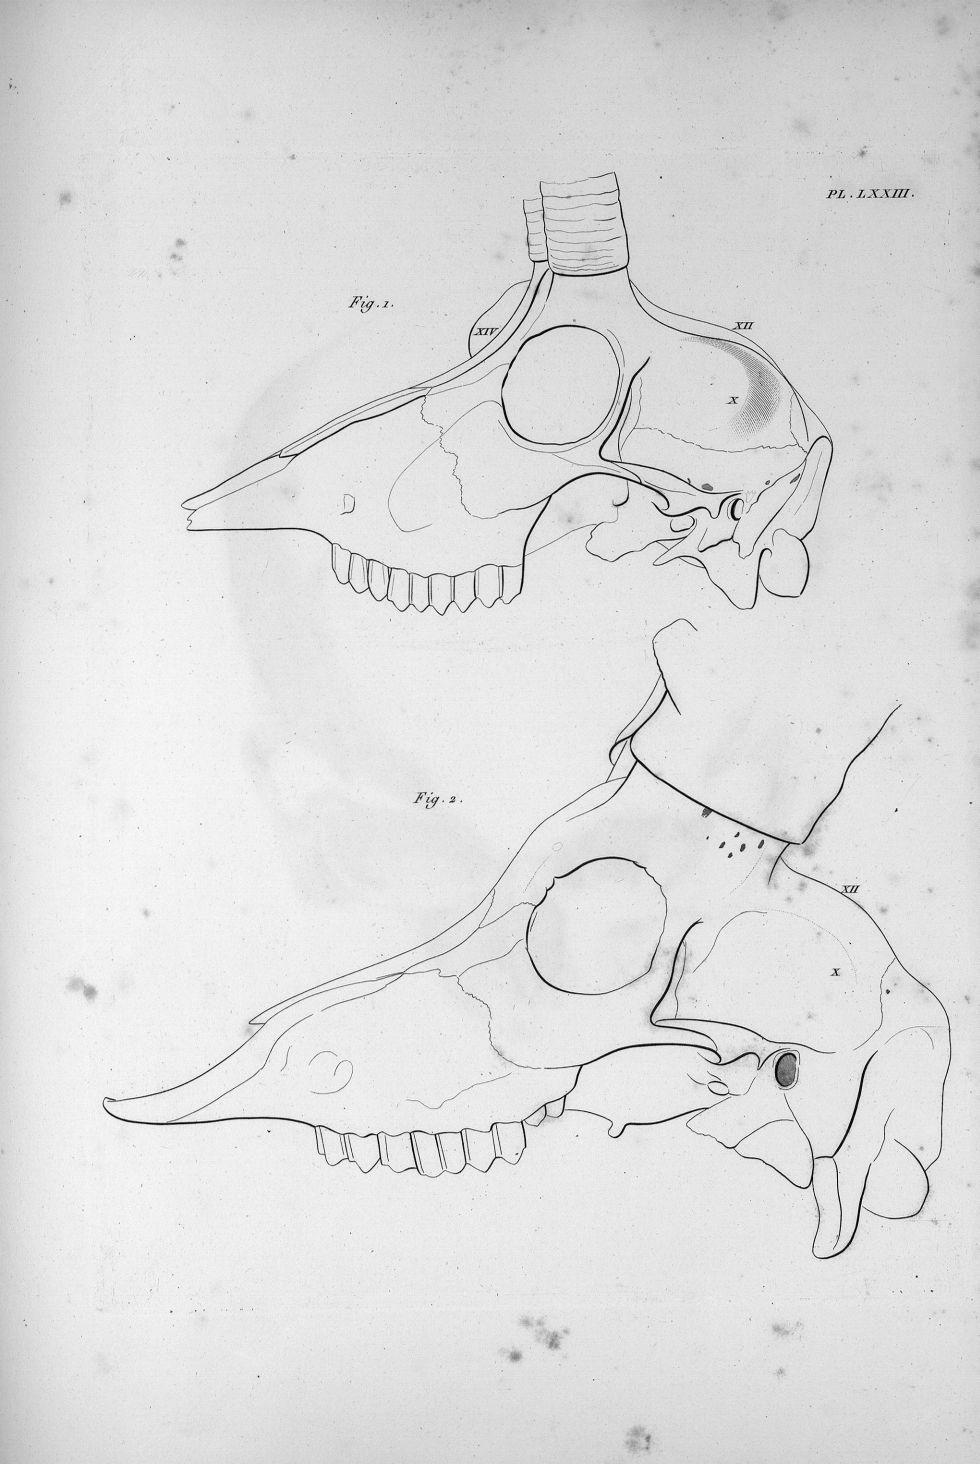 Pl. LXXIII. Fig. 1. Crâne du chamois / fig. 2. Du bouquetin - Anatomie et physiologie du système ner [...] - Anatomie. Neurologie. Crânes. Animal, animaux. Phrénologie. 19e siècle (France) - med00575x03x0331